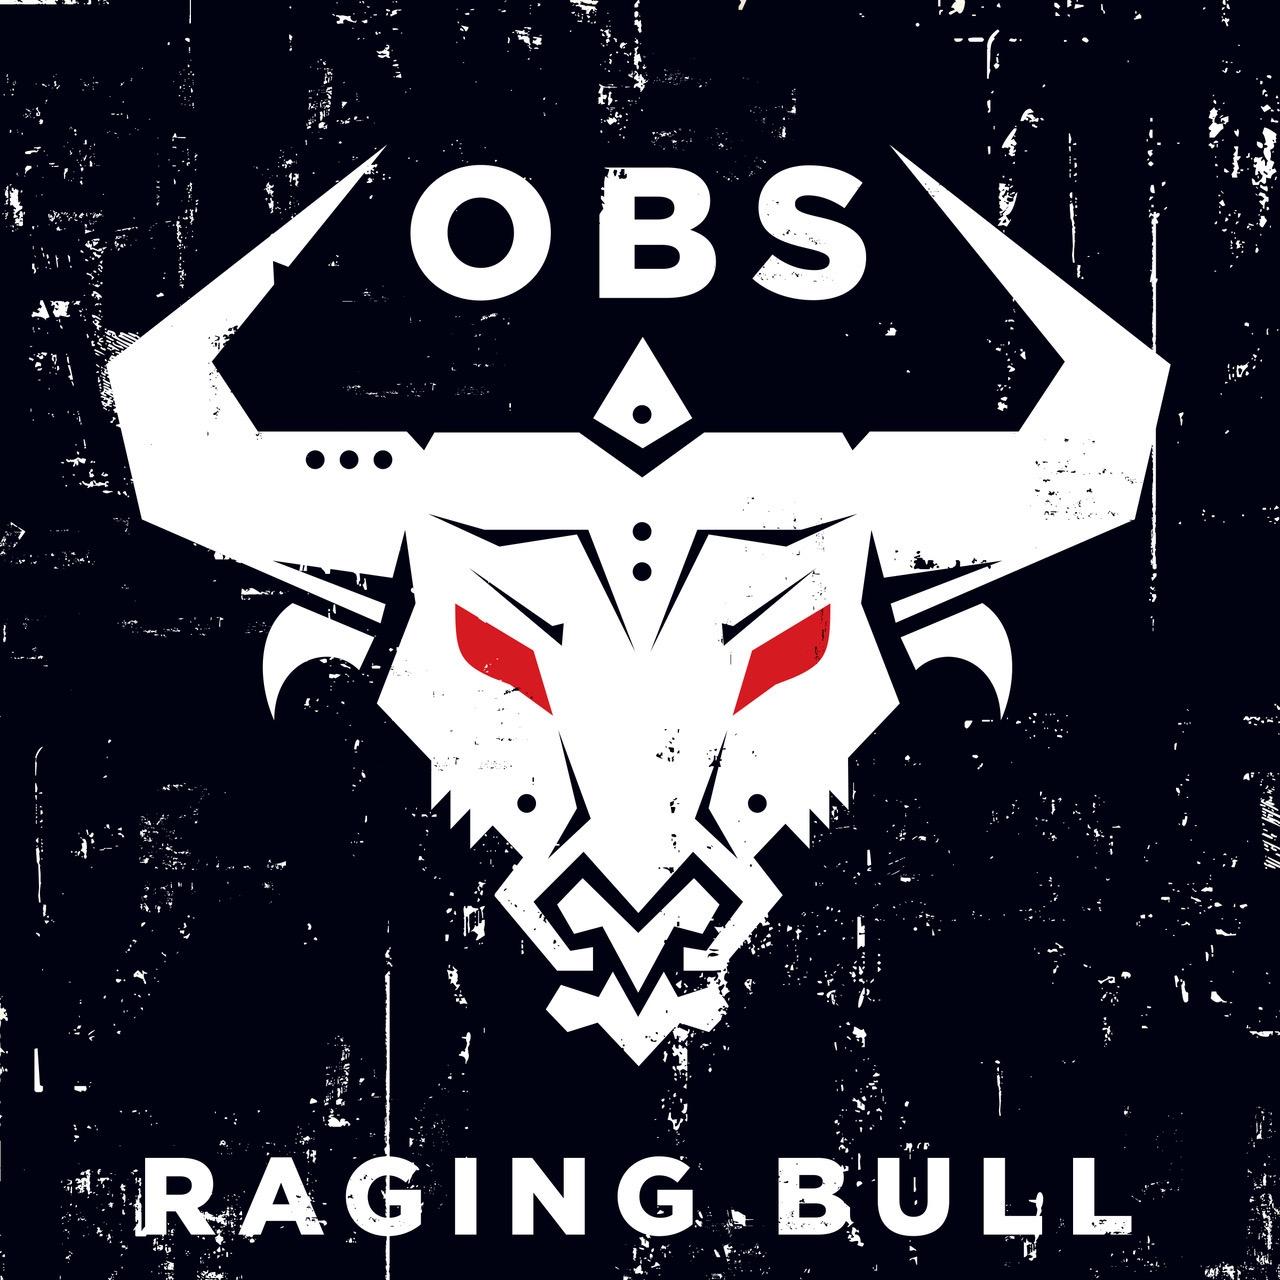 One Bad Son - Raging Bull